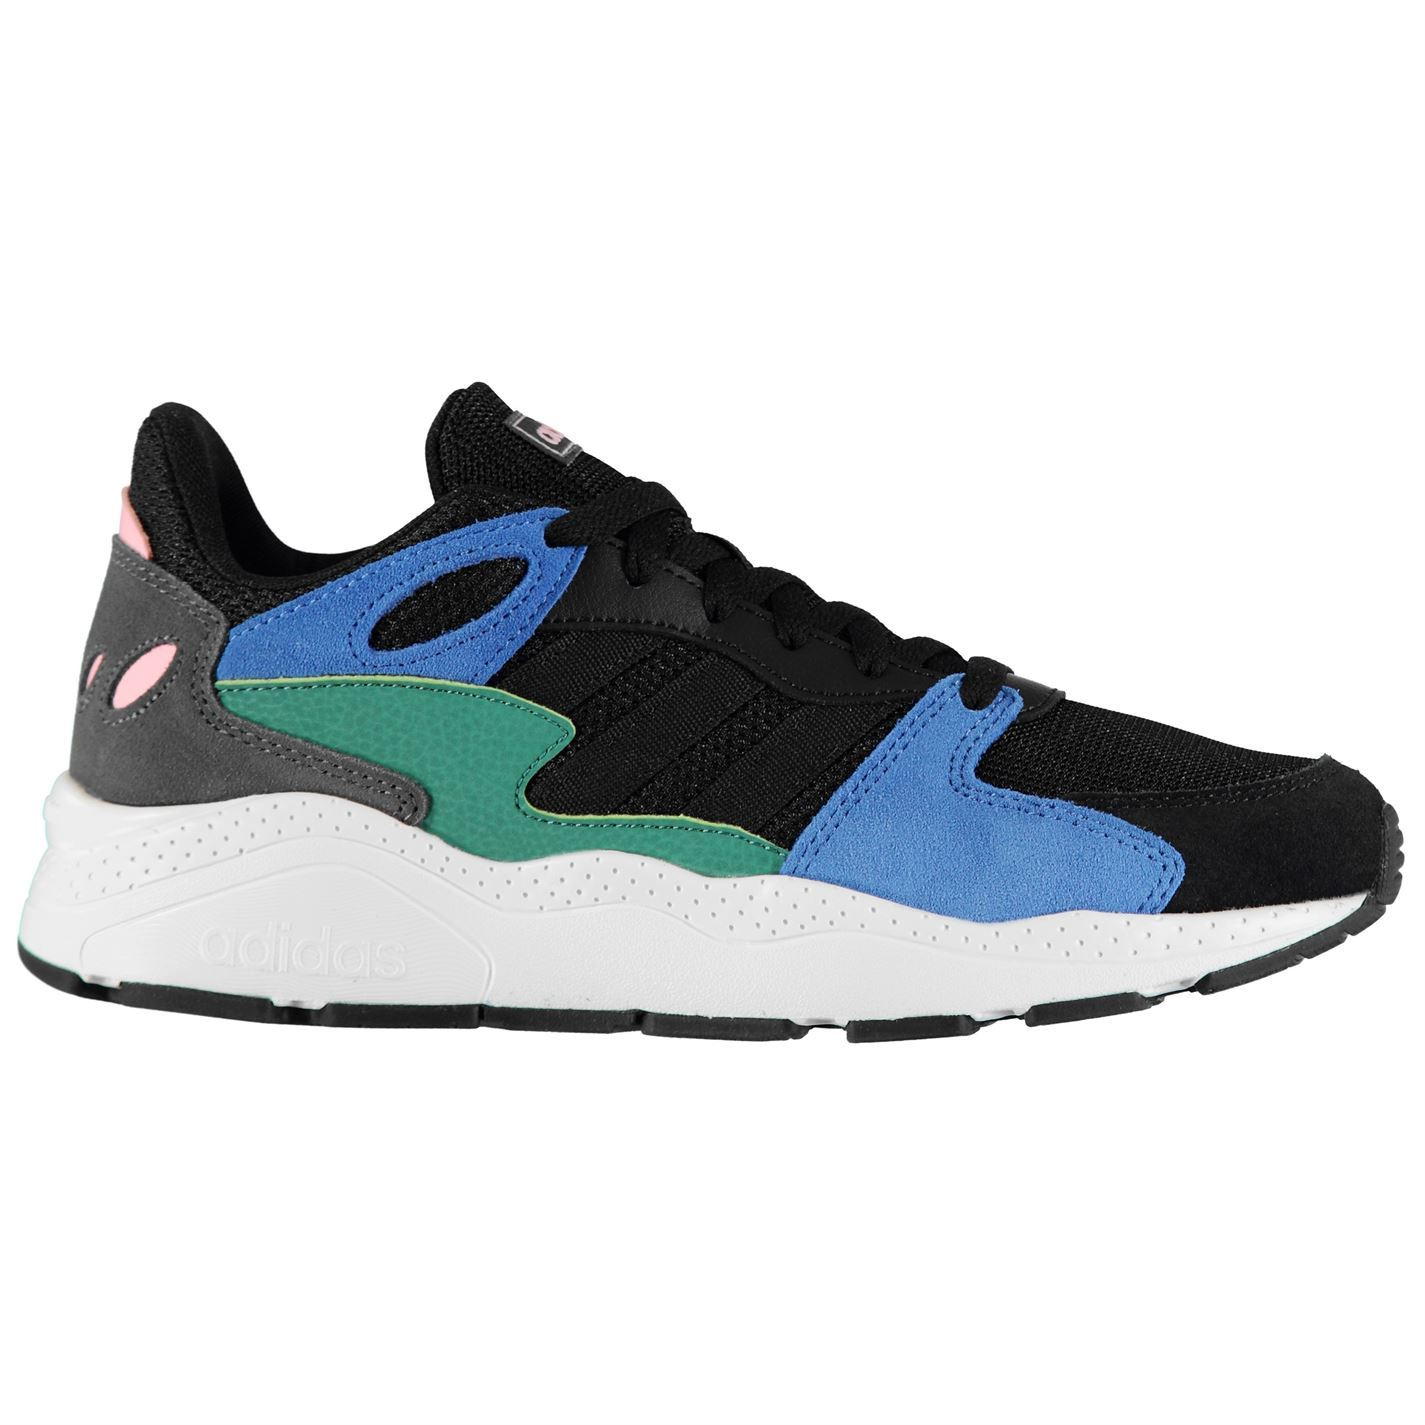 Adidas-Crazychaos-Baskets-Homme-Chaussures-De-Loisirs-Chaussures-Baskets miniature 11